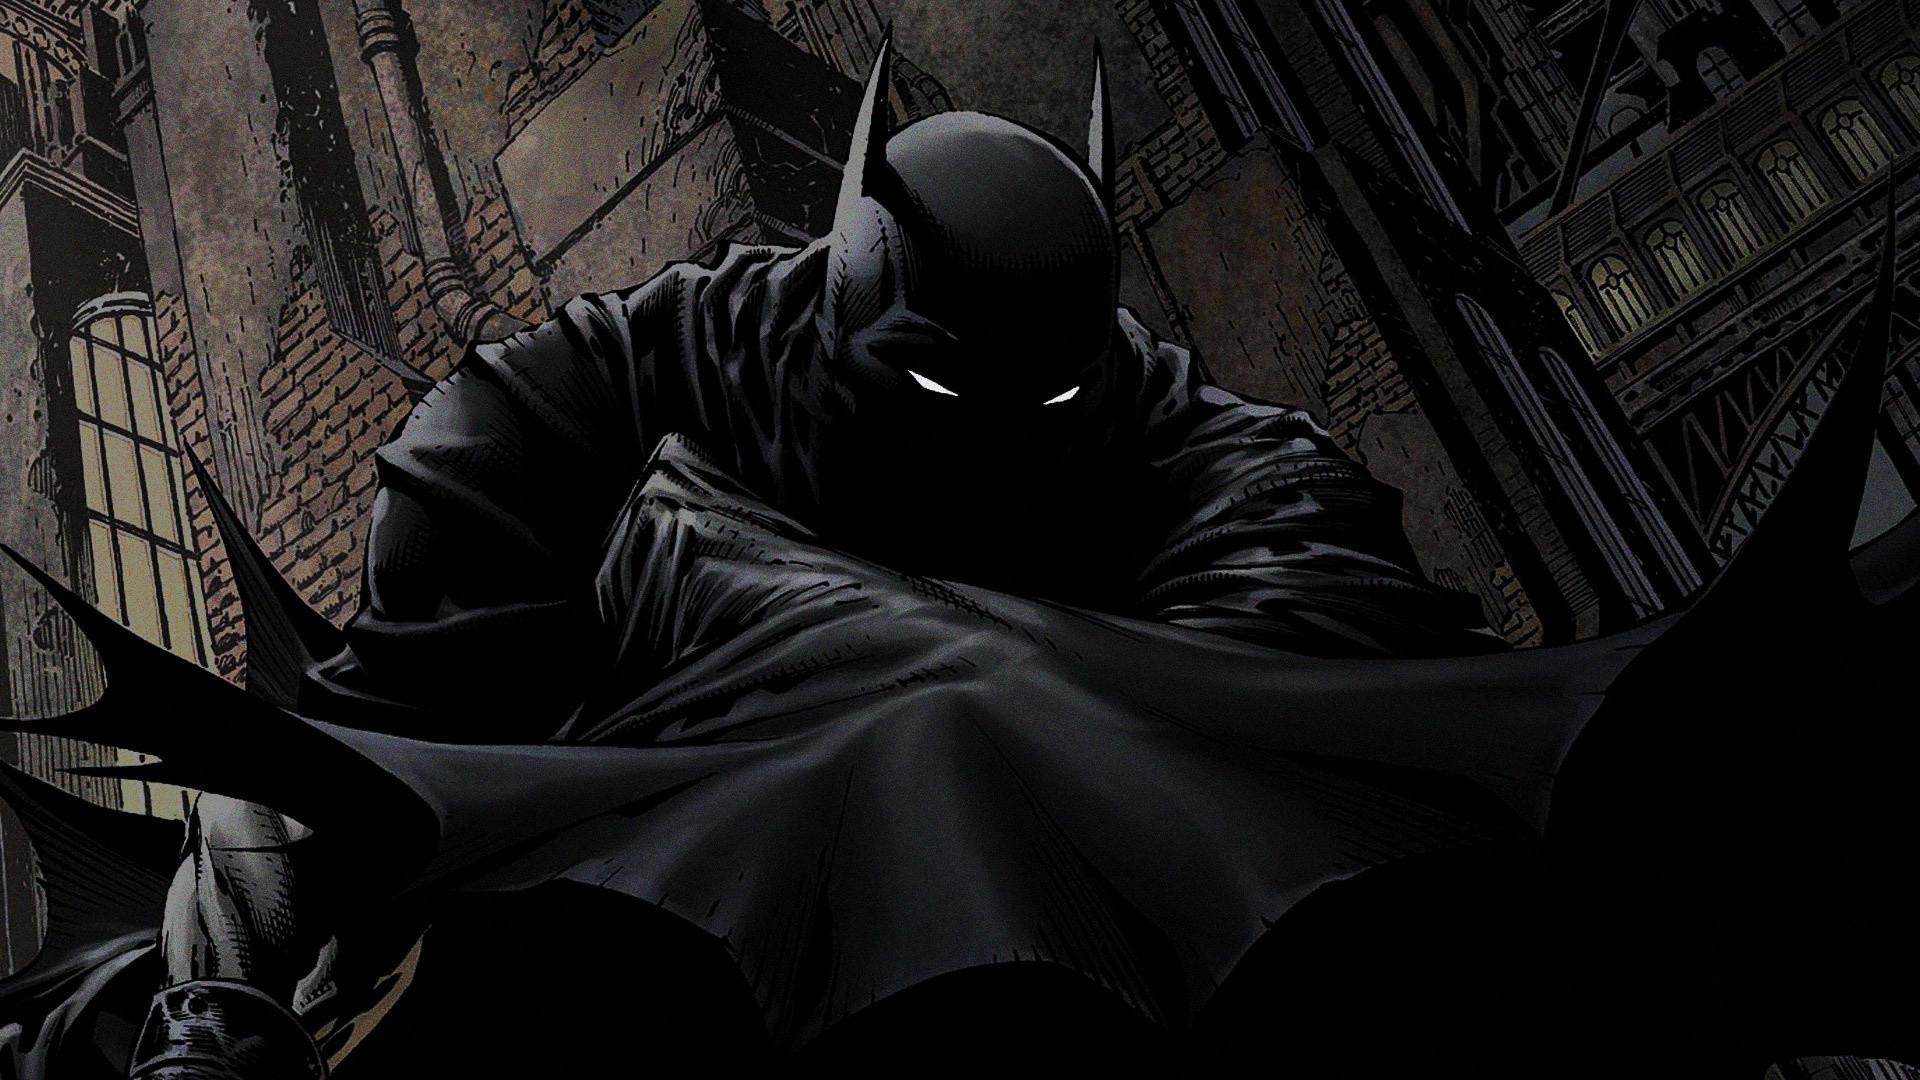 Batman and Joker Wallpaper for Desktop (21)